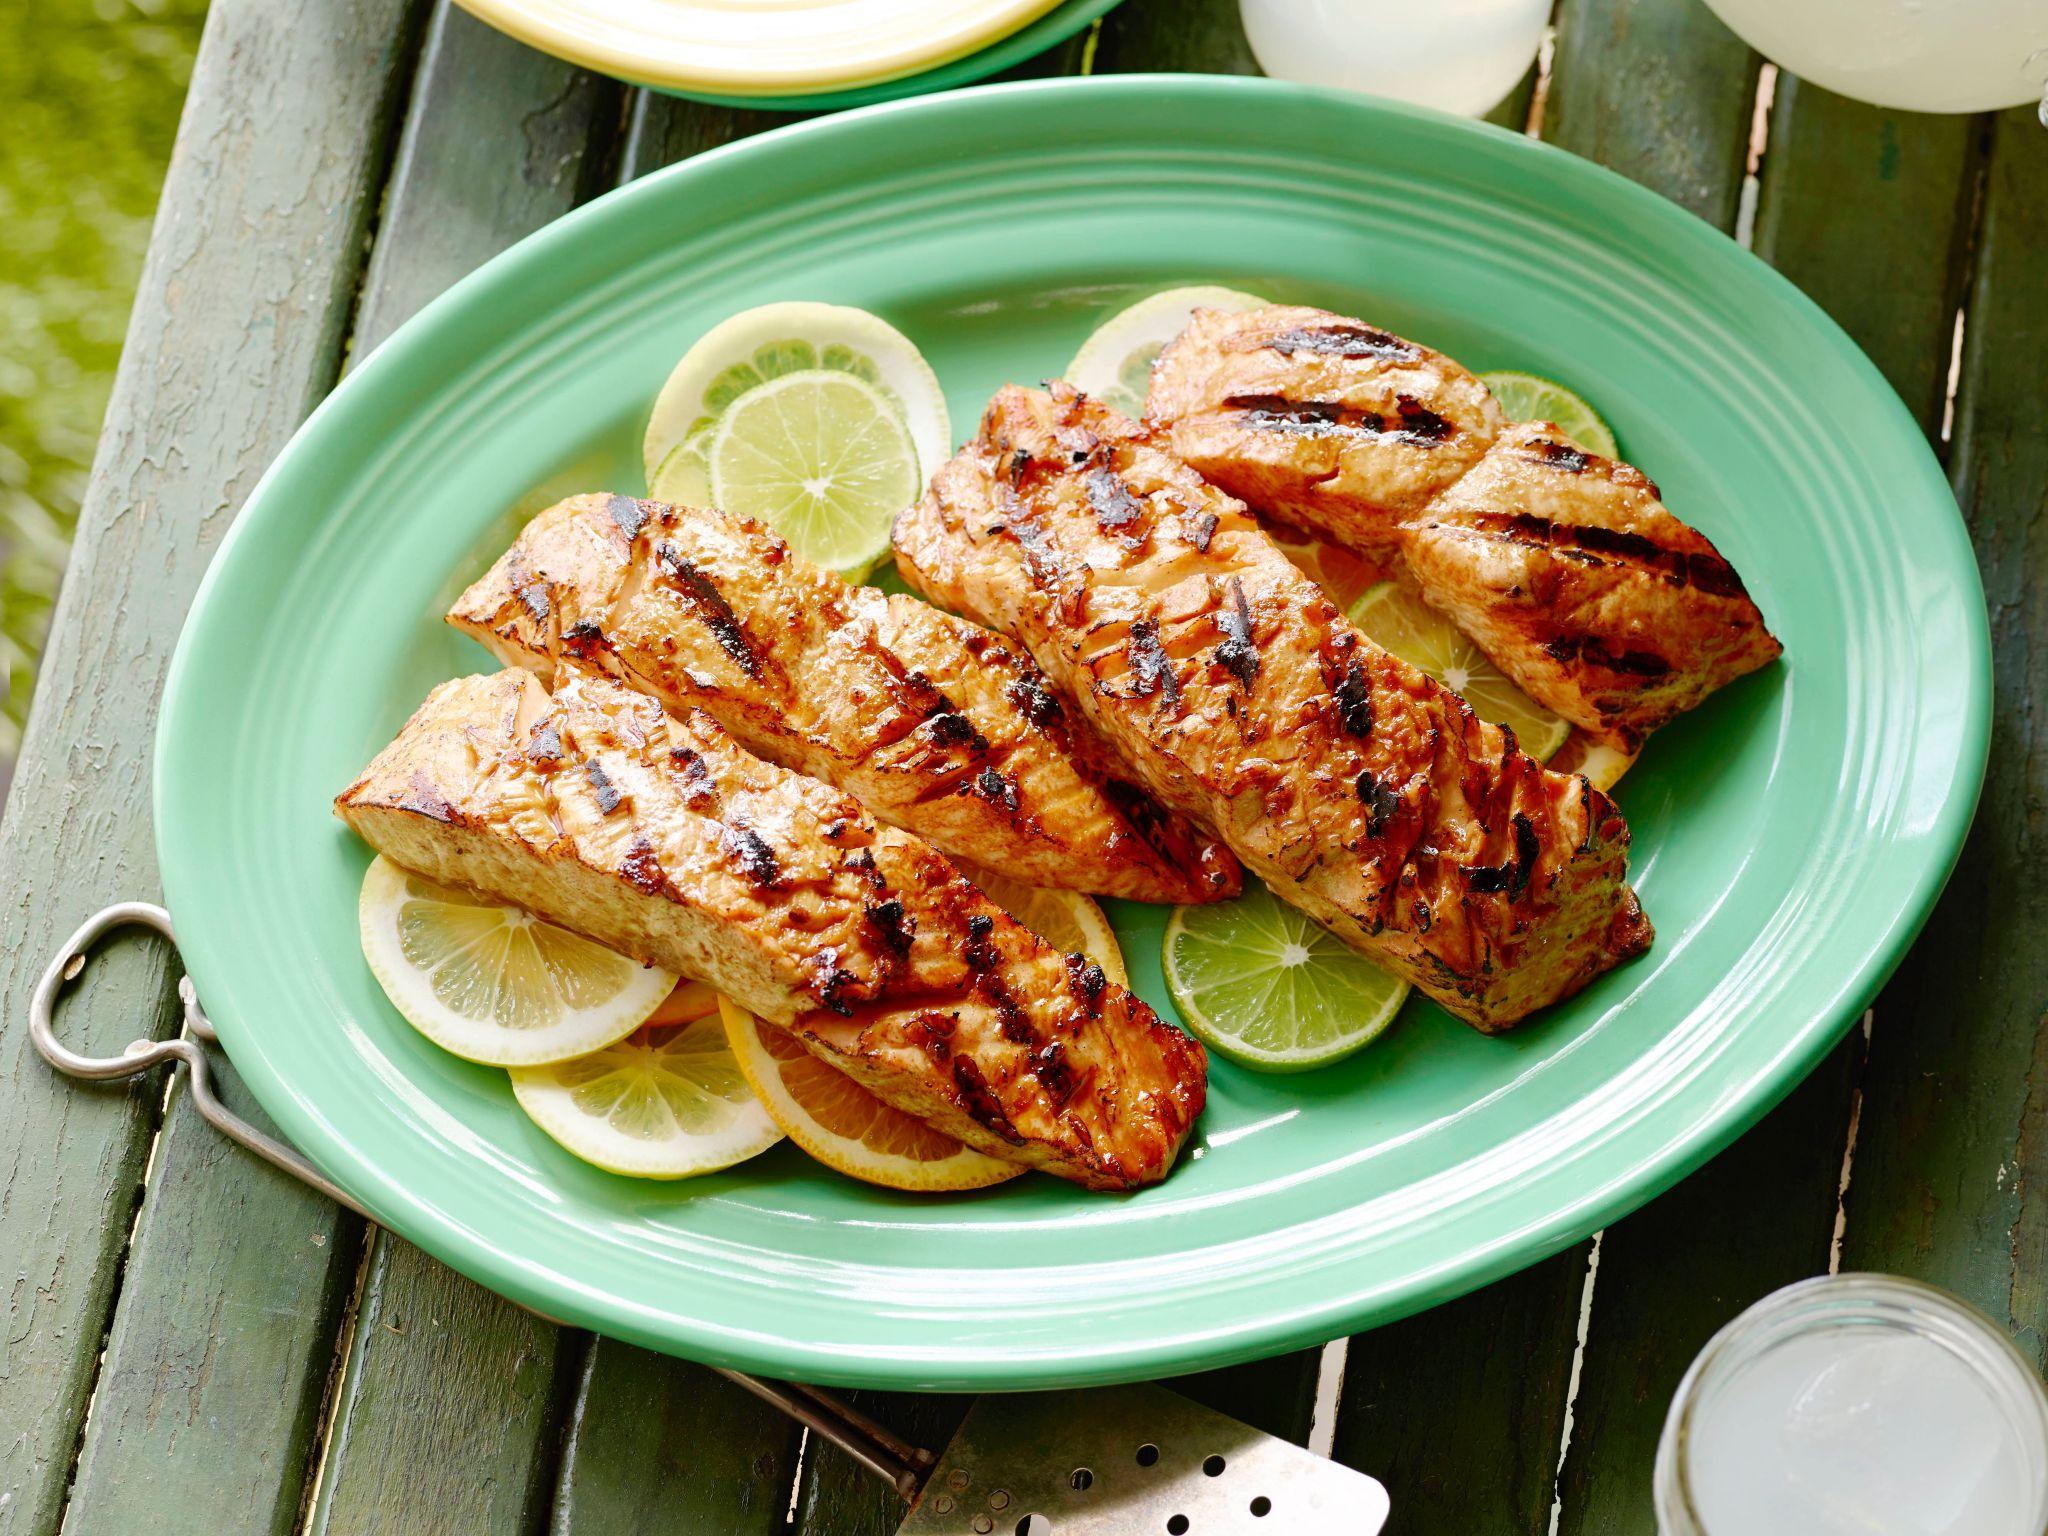 Citrus-Glazed Salmon Citrus-Glazed Salmon new photo